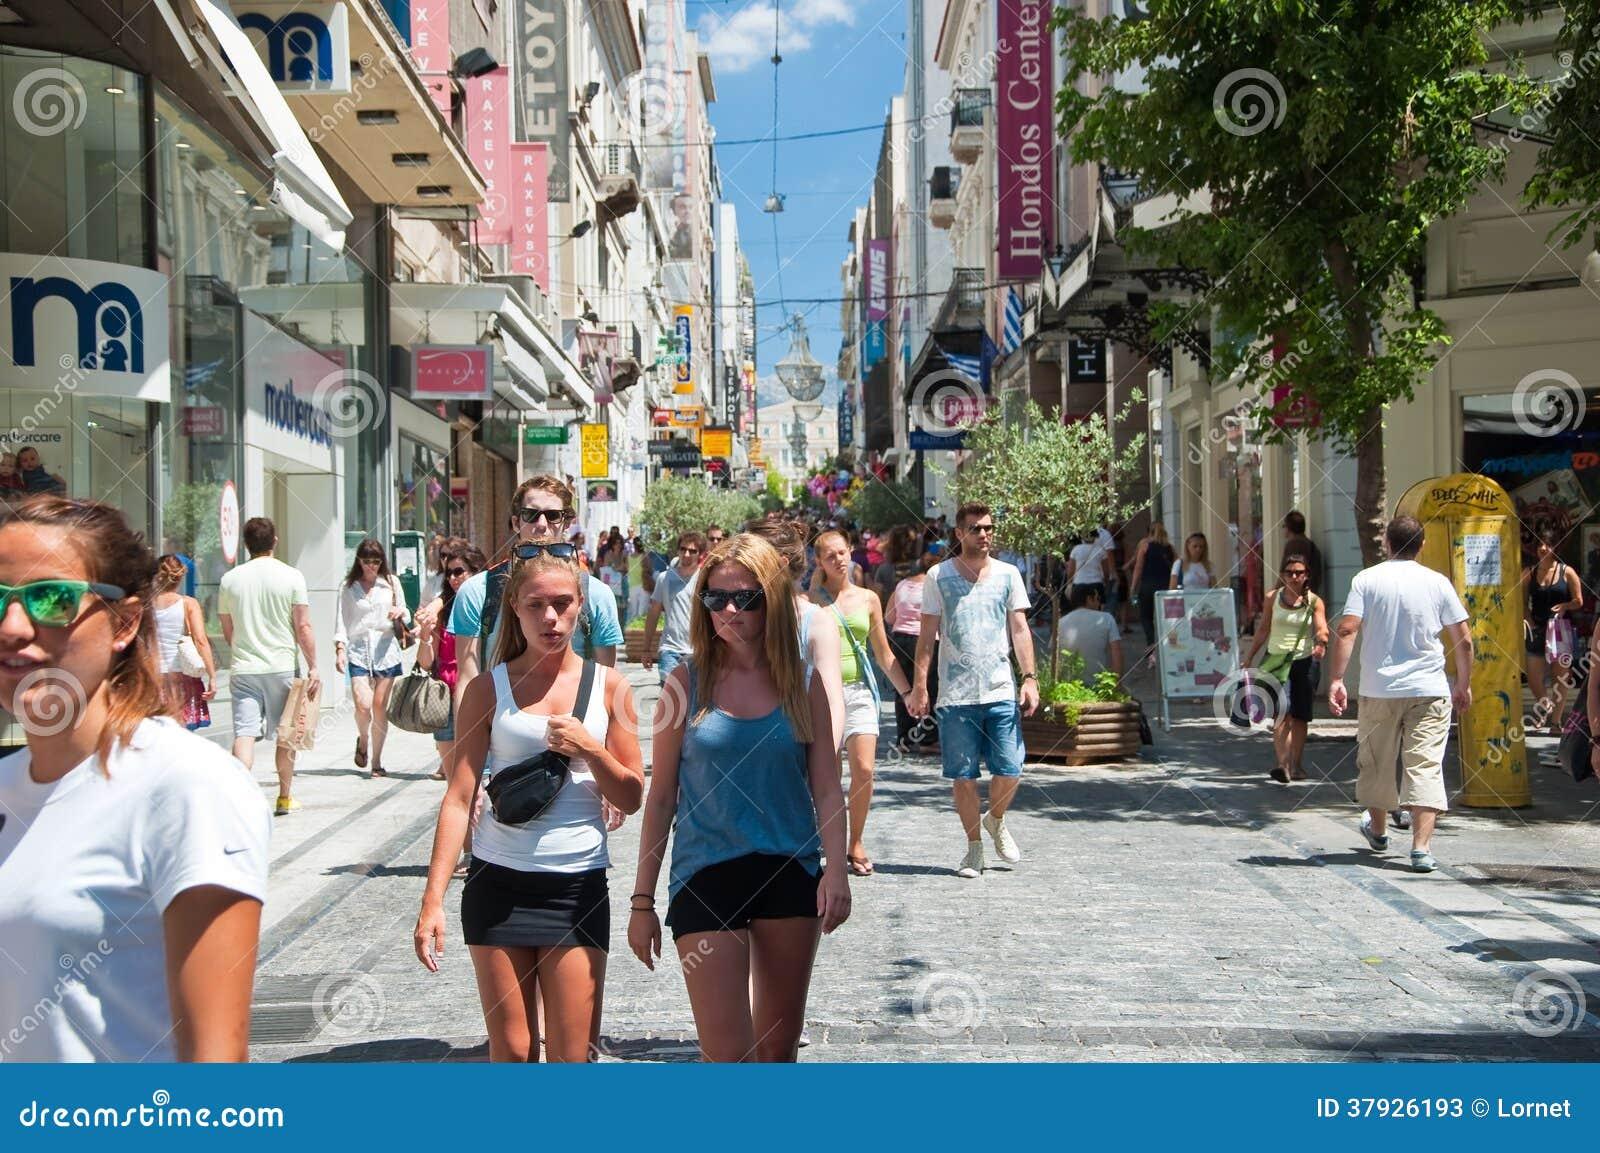 shopping street 3